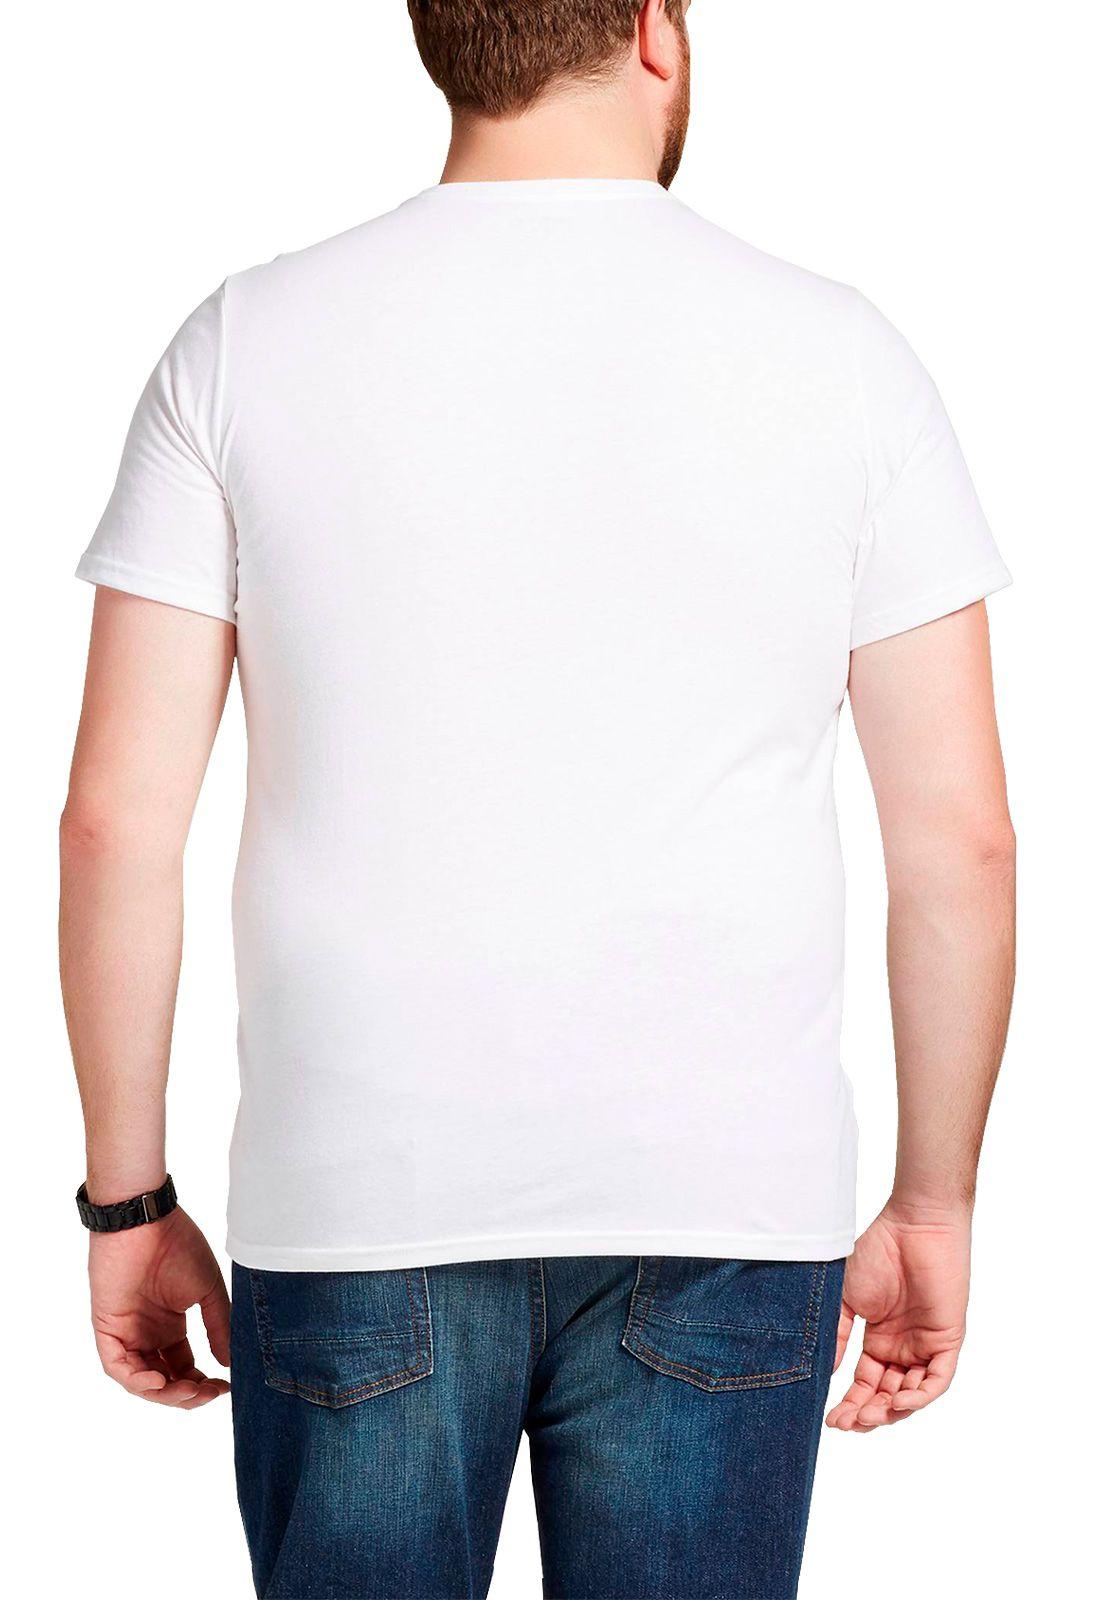 Camiseta Amazônia Pulmão Amazônia - Branco